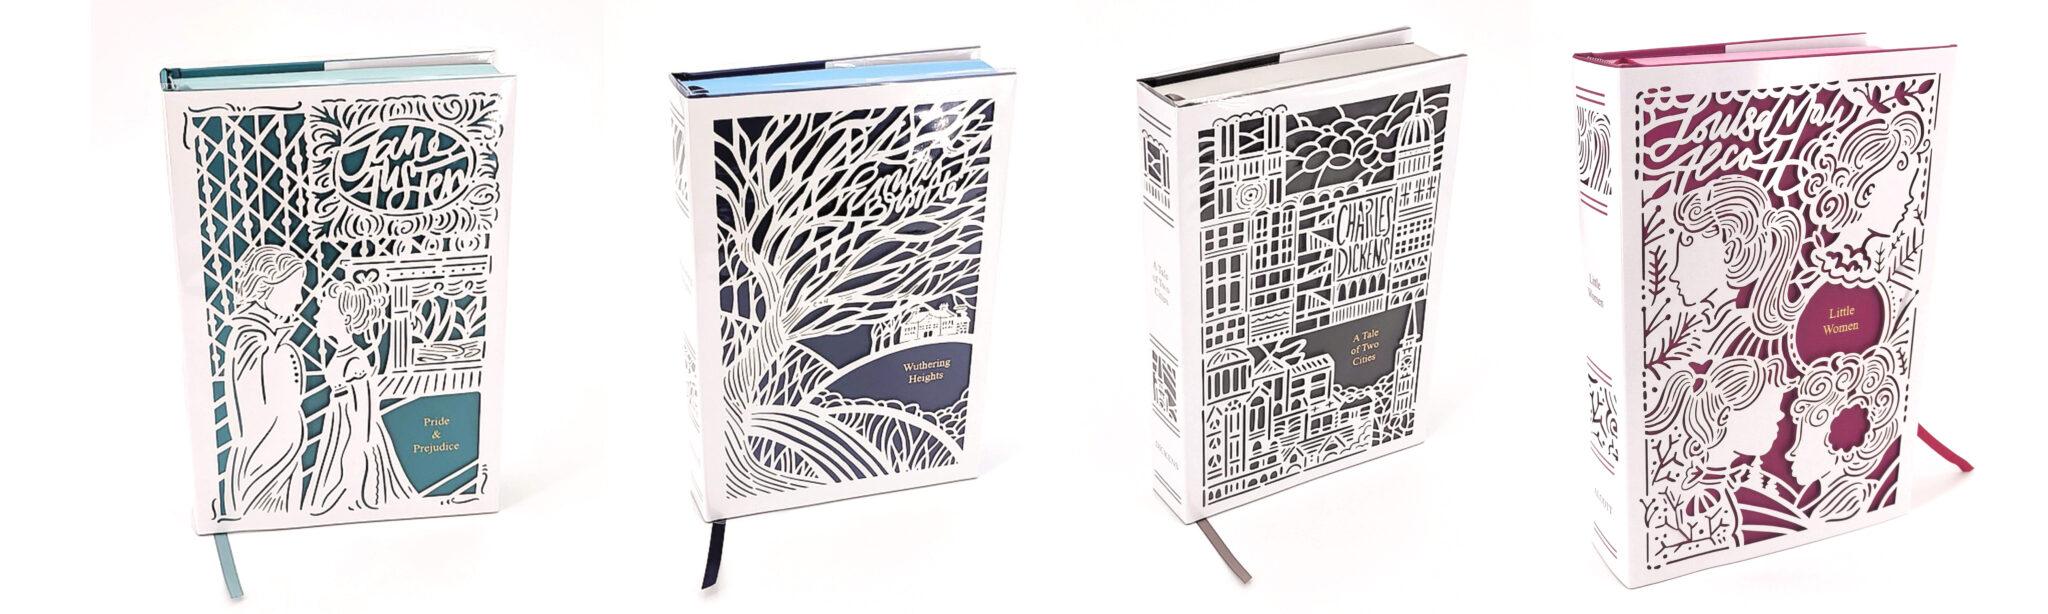 nelson books row